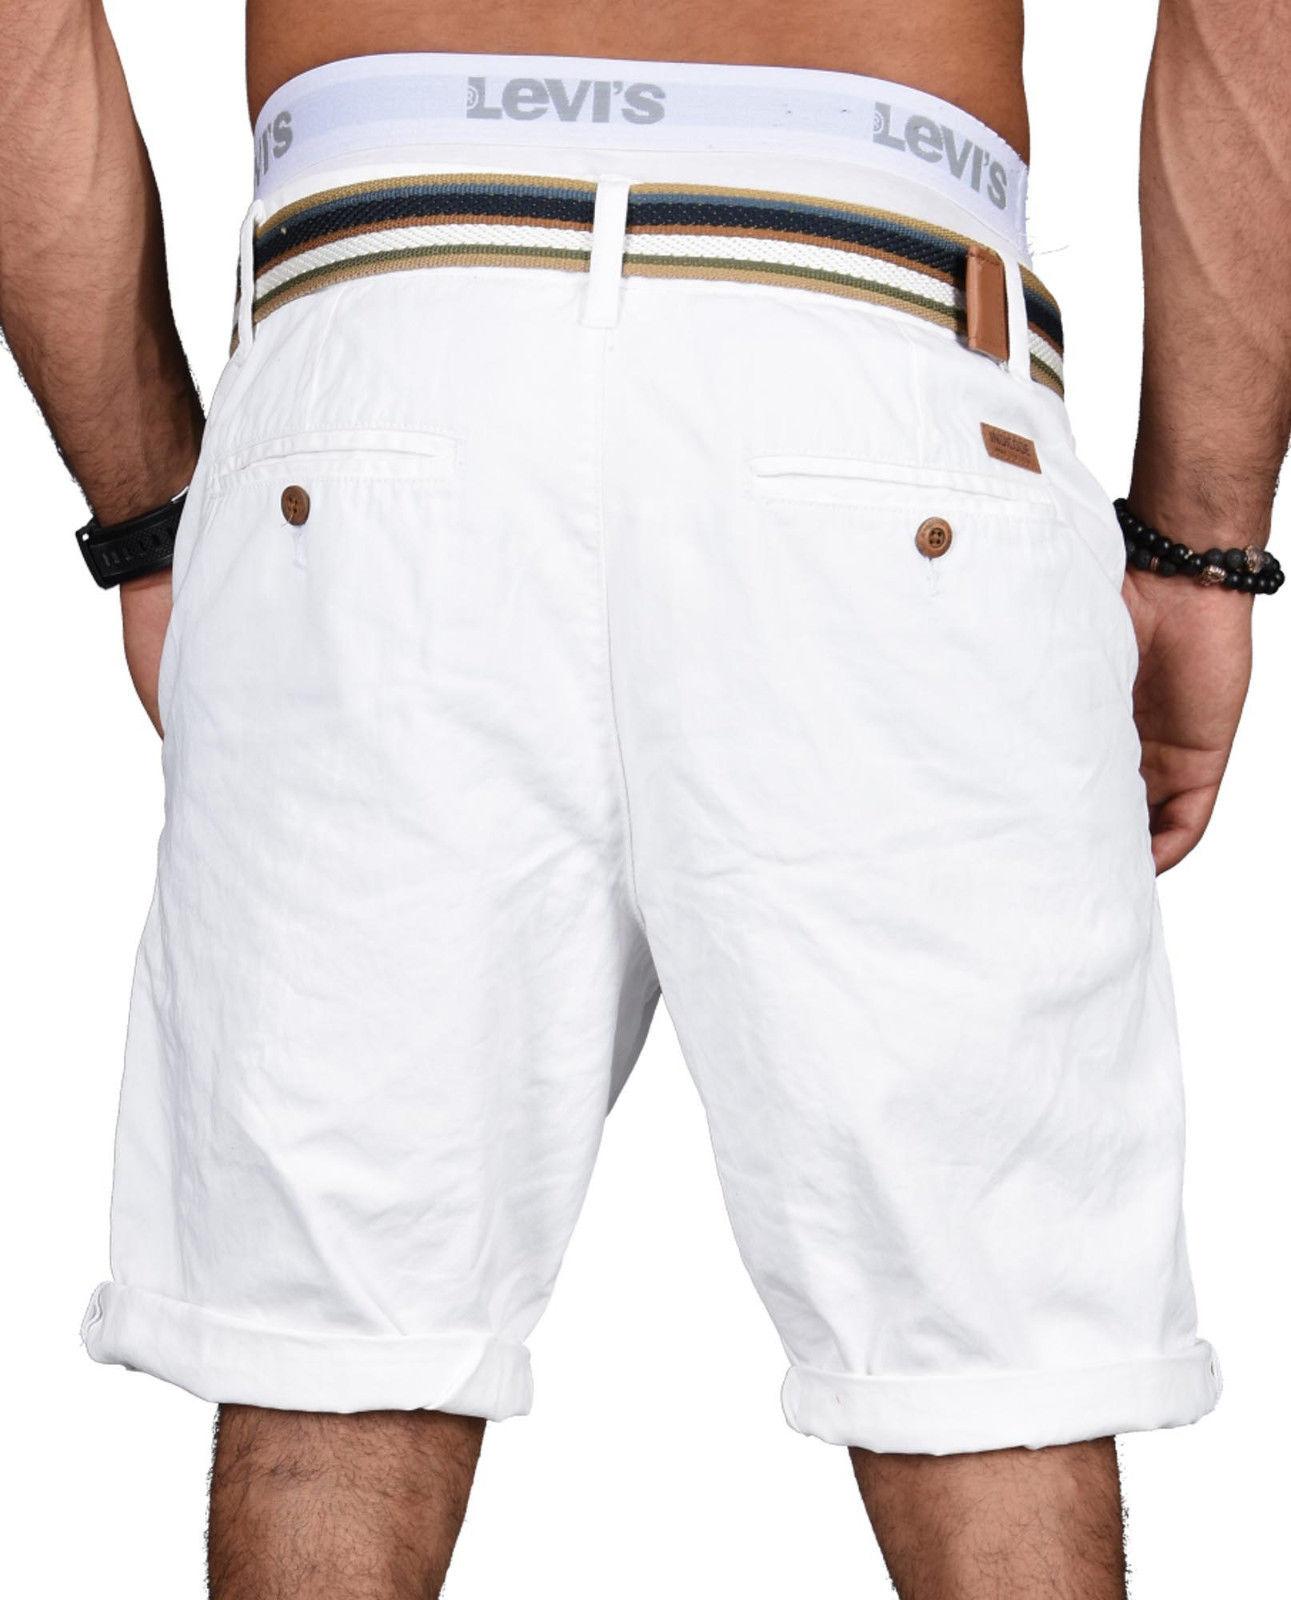 Indicode-Herren-Sommer-Bermuda-Chino-Shorts-kurze-Hose-Sommerhose-Short-NEU-B499 Indexbild 33